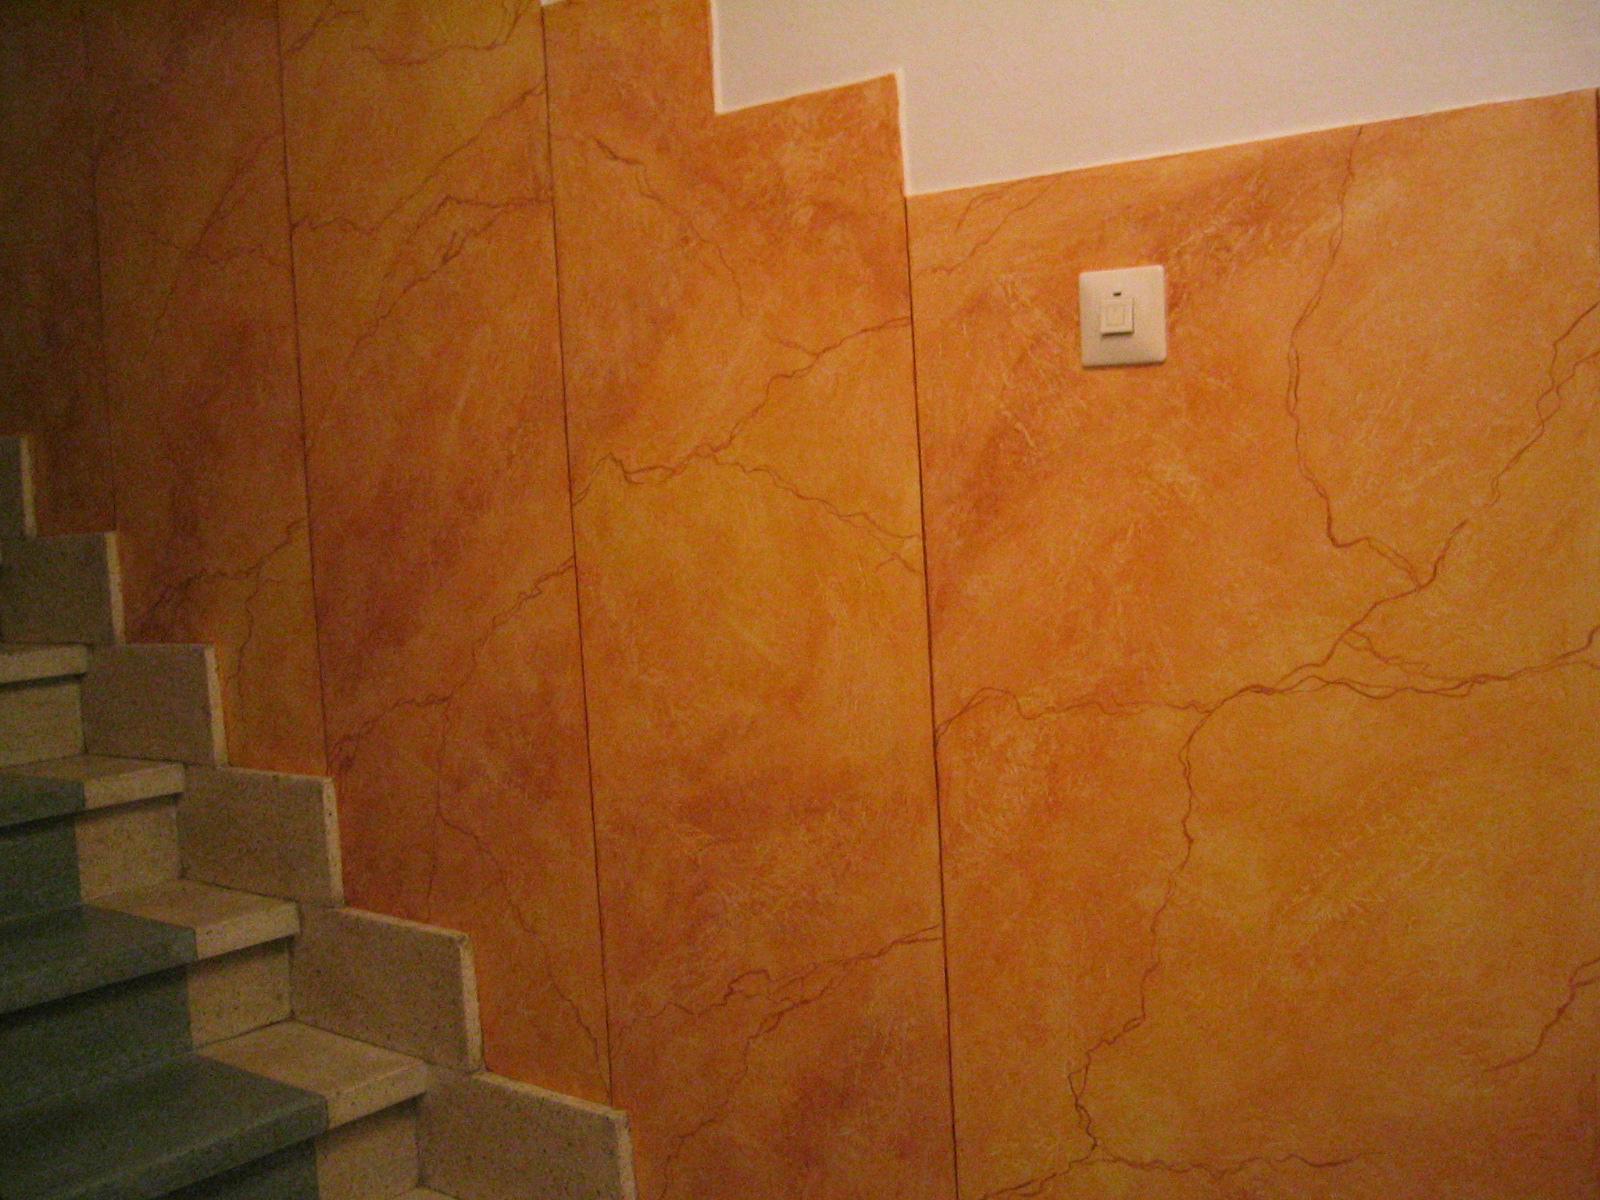 Mimoum blog pintura decorativa sobre escalera - Pintura decorativa para paredes ...